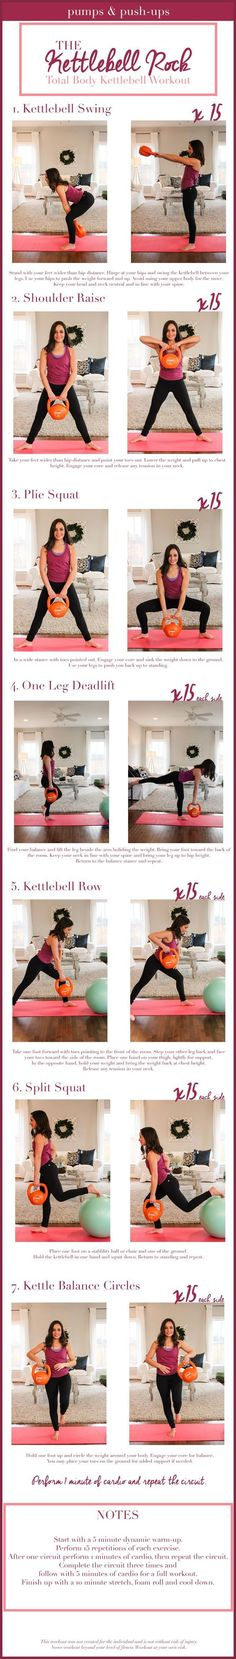 Kettlebell Rock & Oh, Hey Girl! Link-Up The Kettlebell Rock & Oh, Hey Girl! Link-Up Workout Plans workout plans to gain massThe Kettlebell Rock & Oh, Hey Girl! Link-Up Workout Plans workout plans to gain mass Kettle Ball, Kettlebell Training, Workout Kettlebell, Workout Exercises, Workout Tips, Flexibility Exercises, Tabata, Fitness Motivation, Sport Motivation